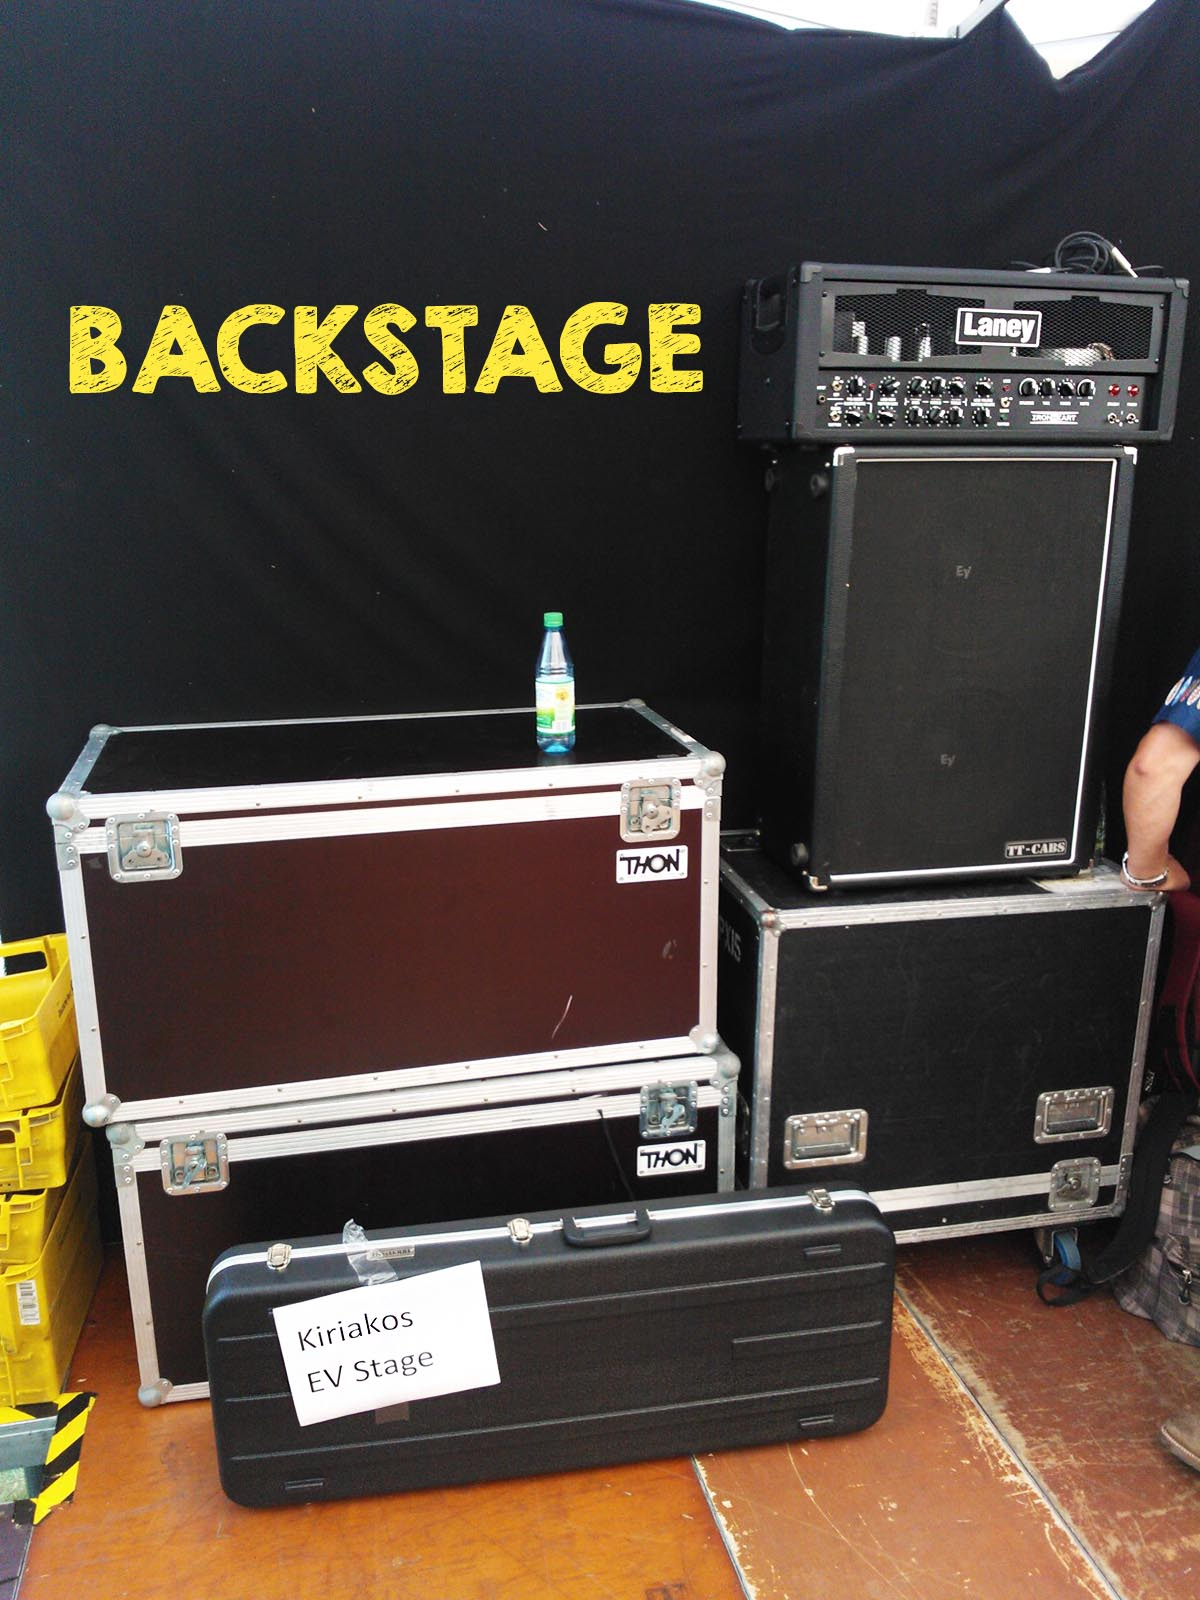 sommerfest-2015-backstage-kiriakosgp-03